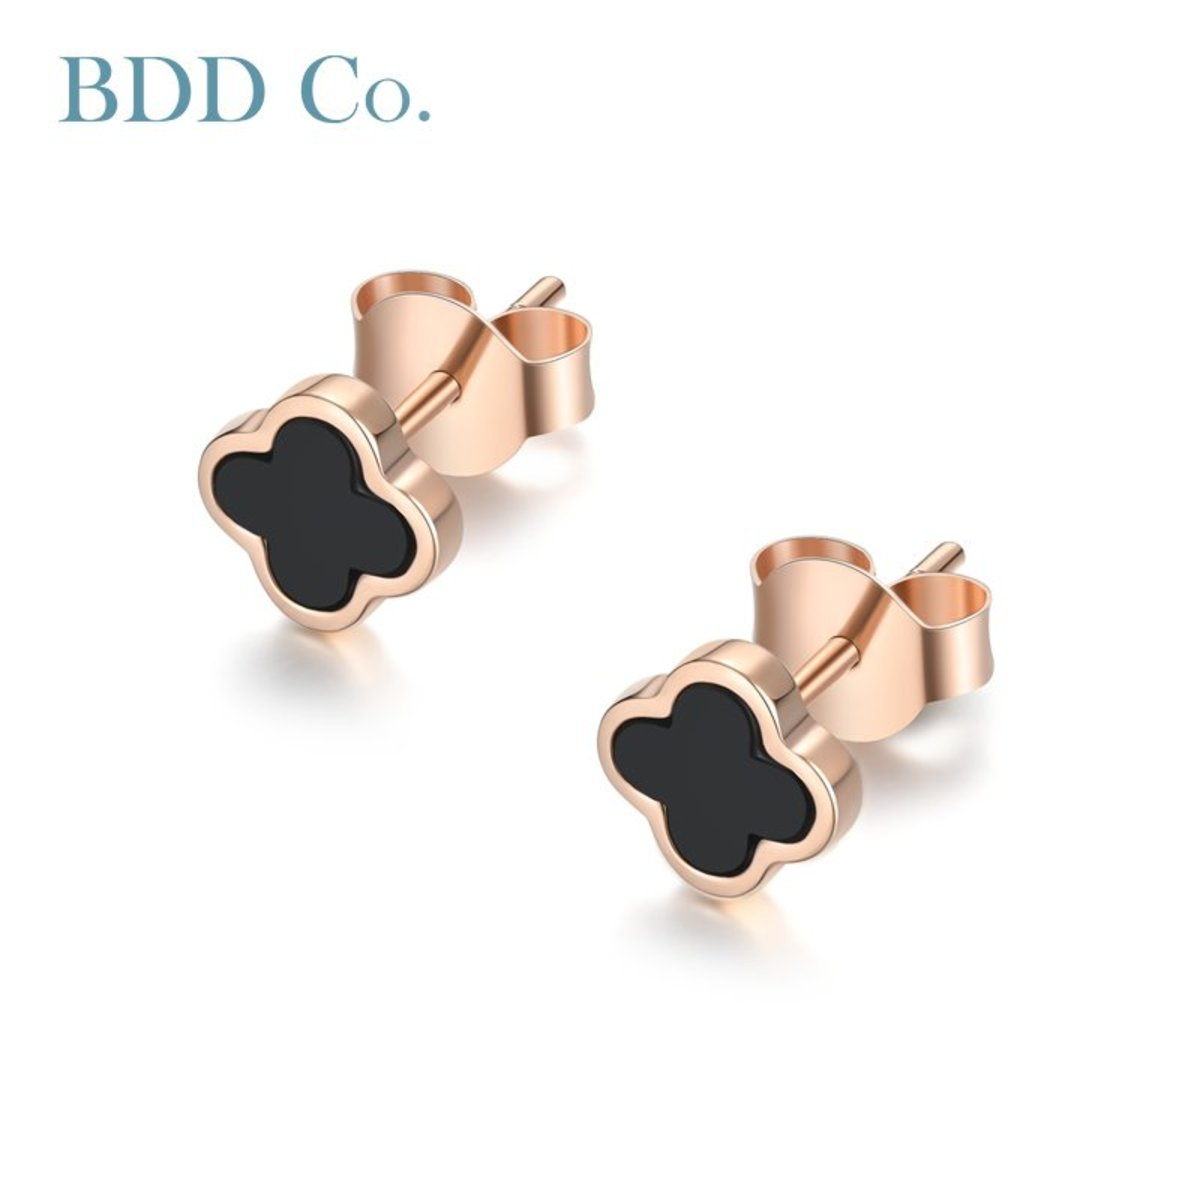 【BDD-Co.】18k玫瑰金Au750 四葉草黑瑪瑙玫瑰K金耳環